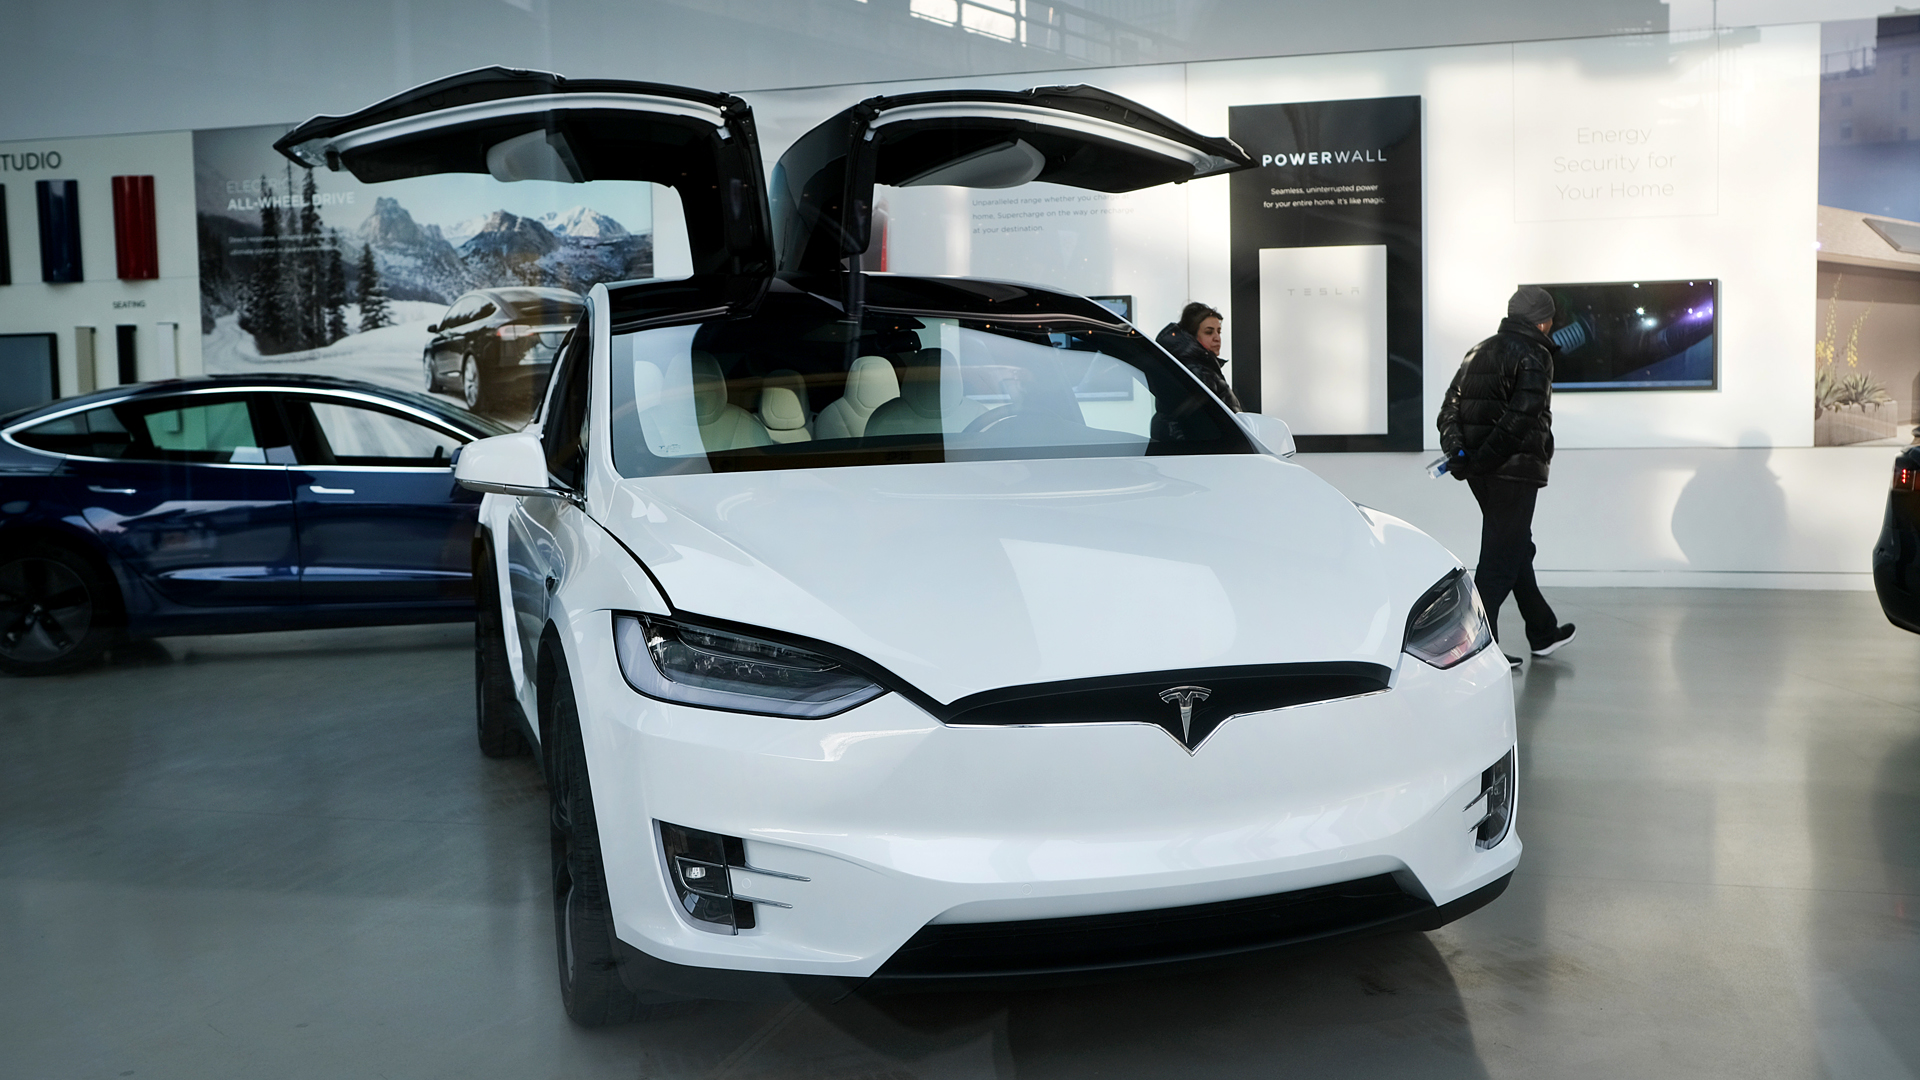 'As Promised': Elon Musk Opens Tesla India